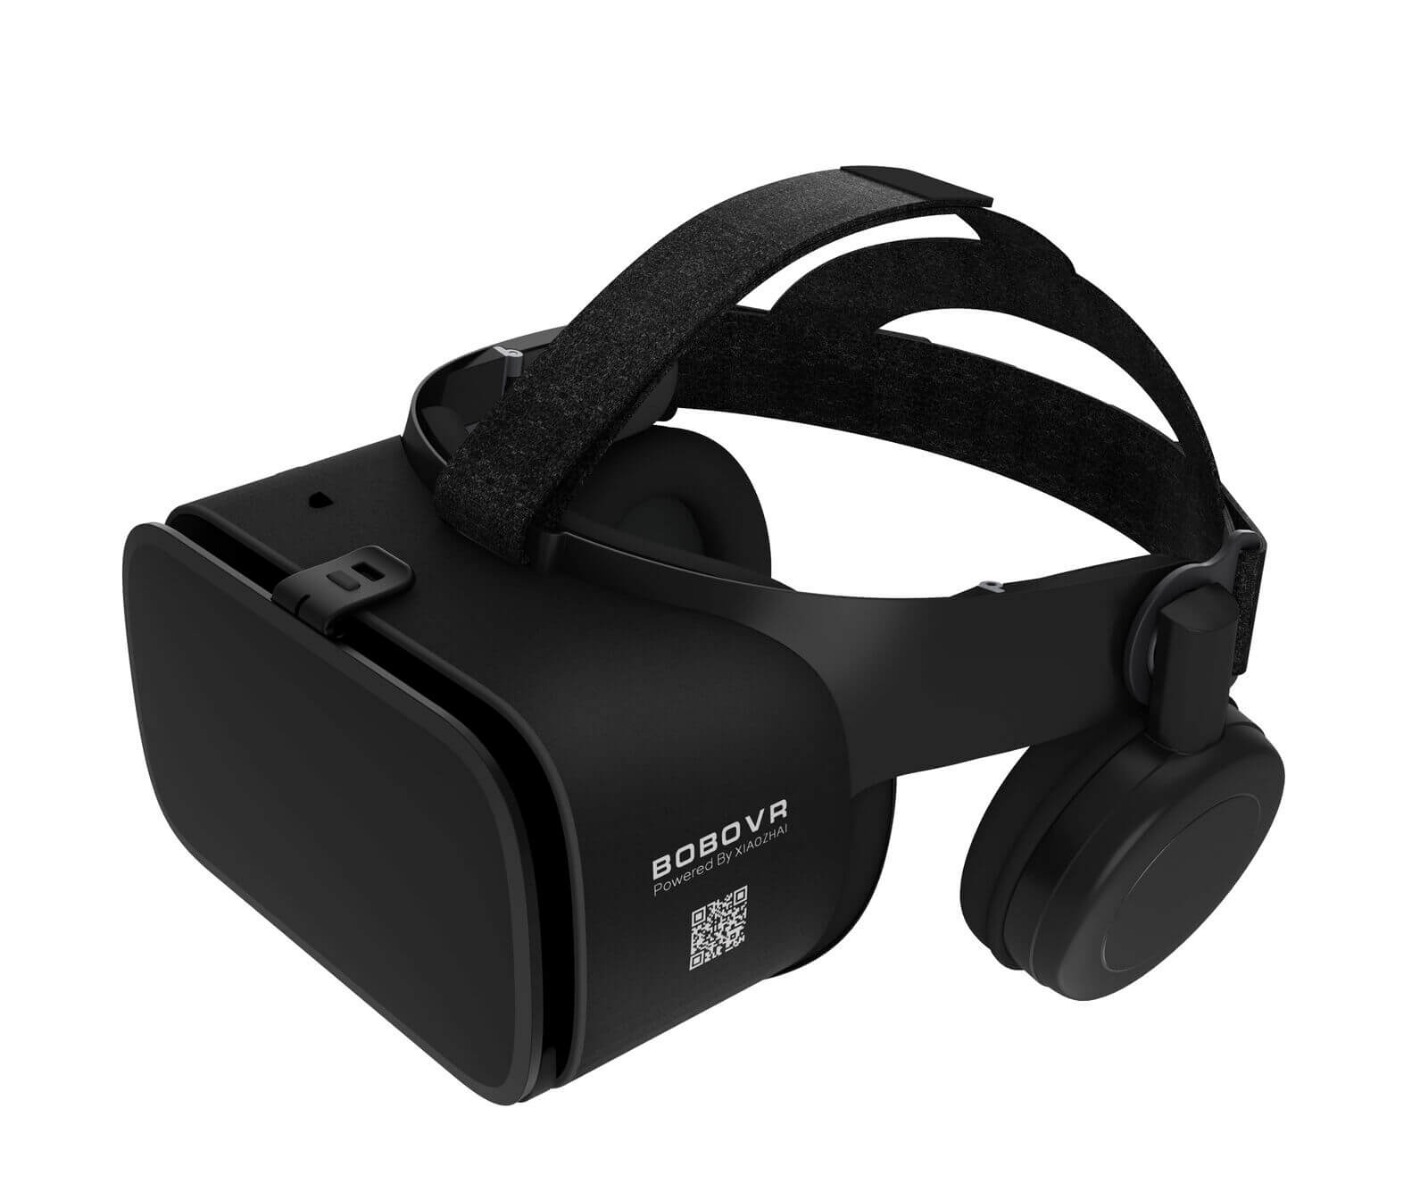 Очки виртуальной реальности BoboVR Z6 Wireless